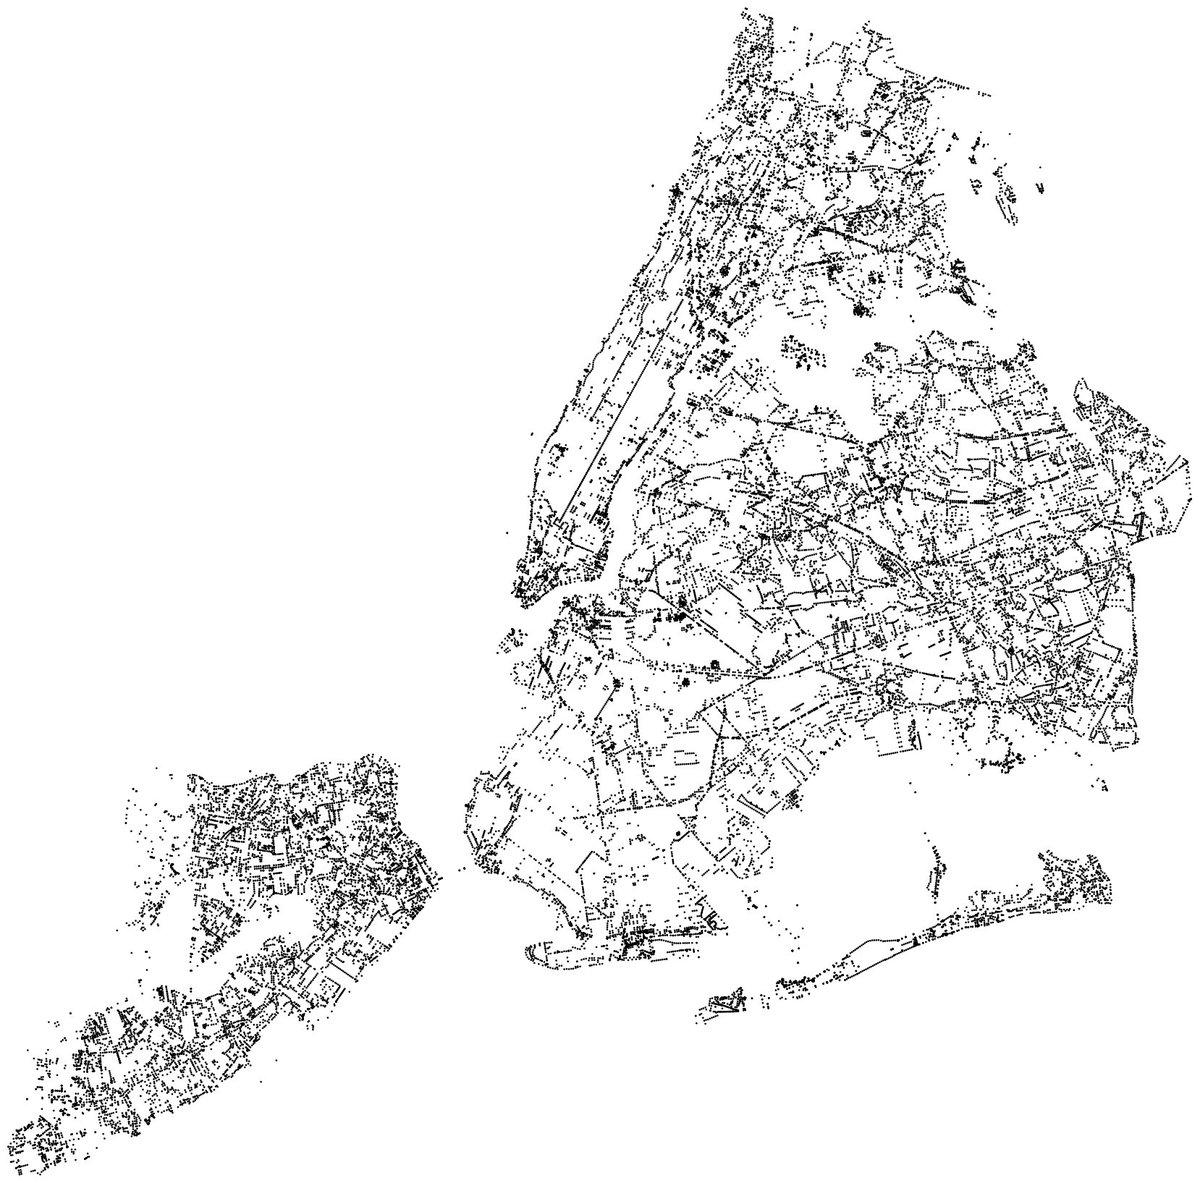 Neil Freeman Fitnr Twitter - Neil freeman us map